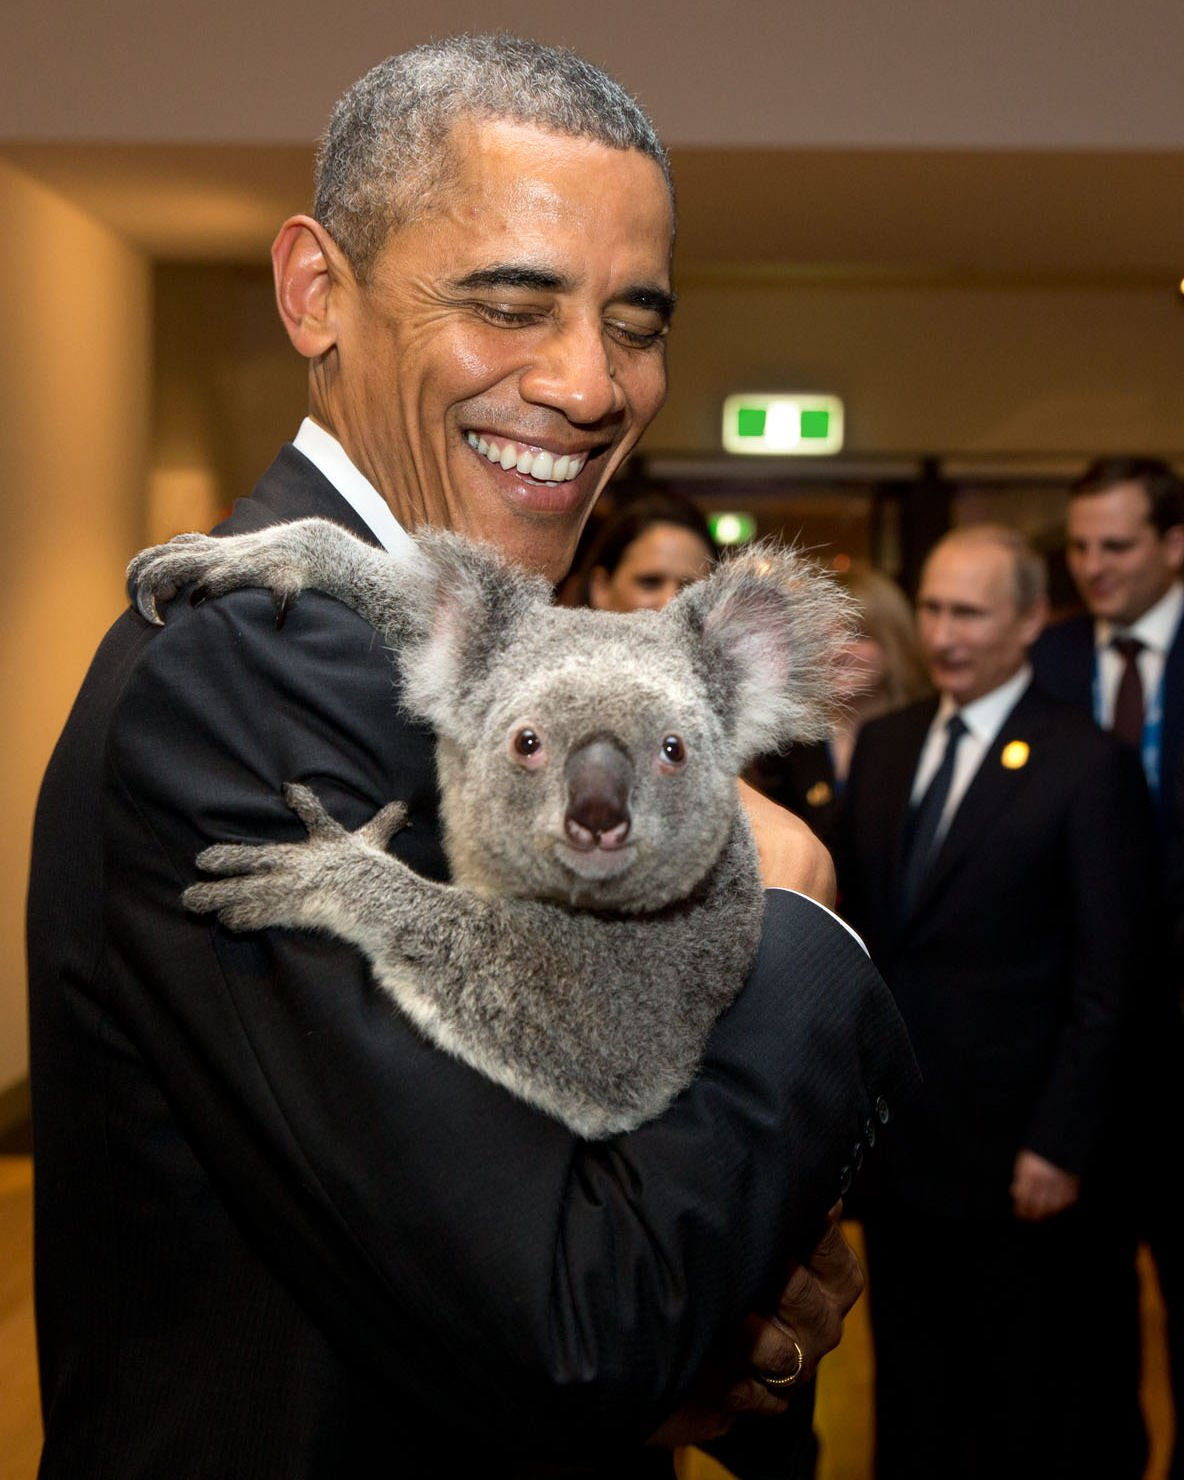 BARACK OBAMA HOLDS KOALA BEAR IN BRISBANE, AUSTRALIA @ G20 - 8X10 PHOTO (EE-042)